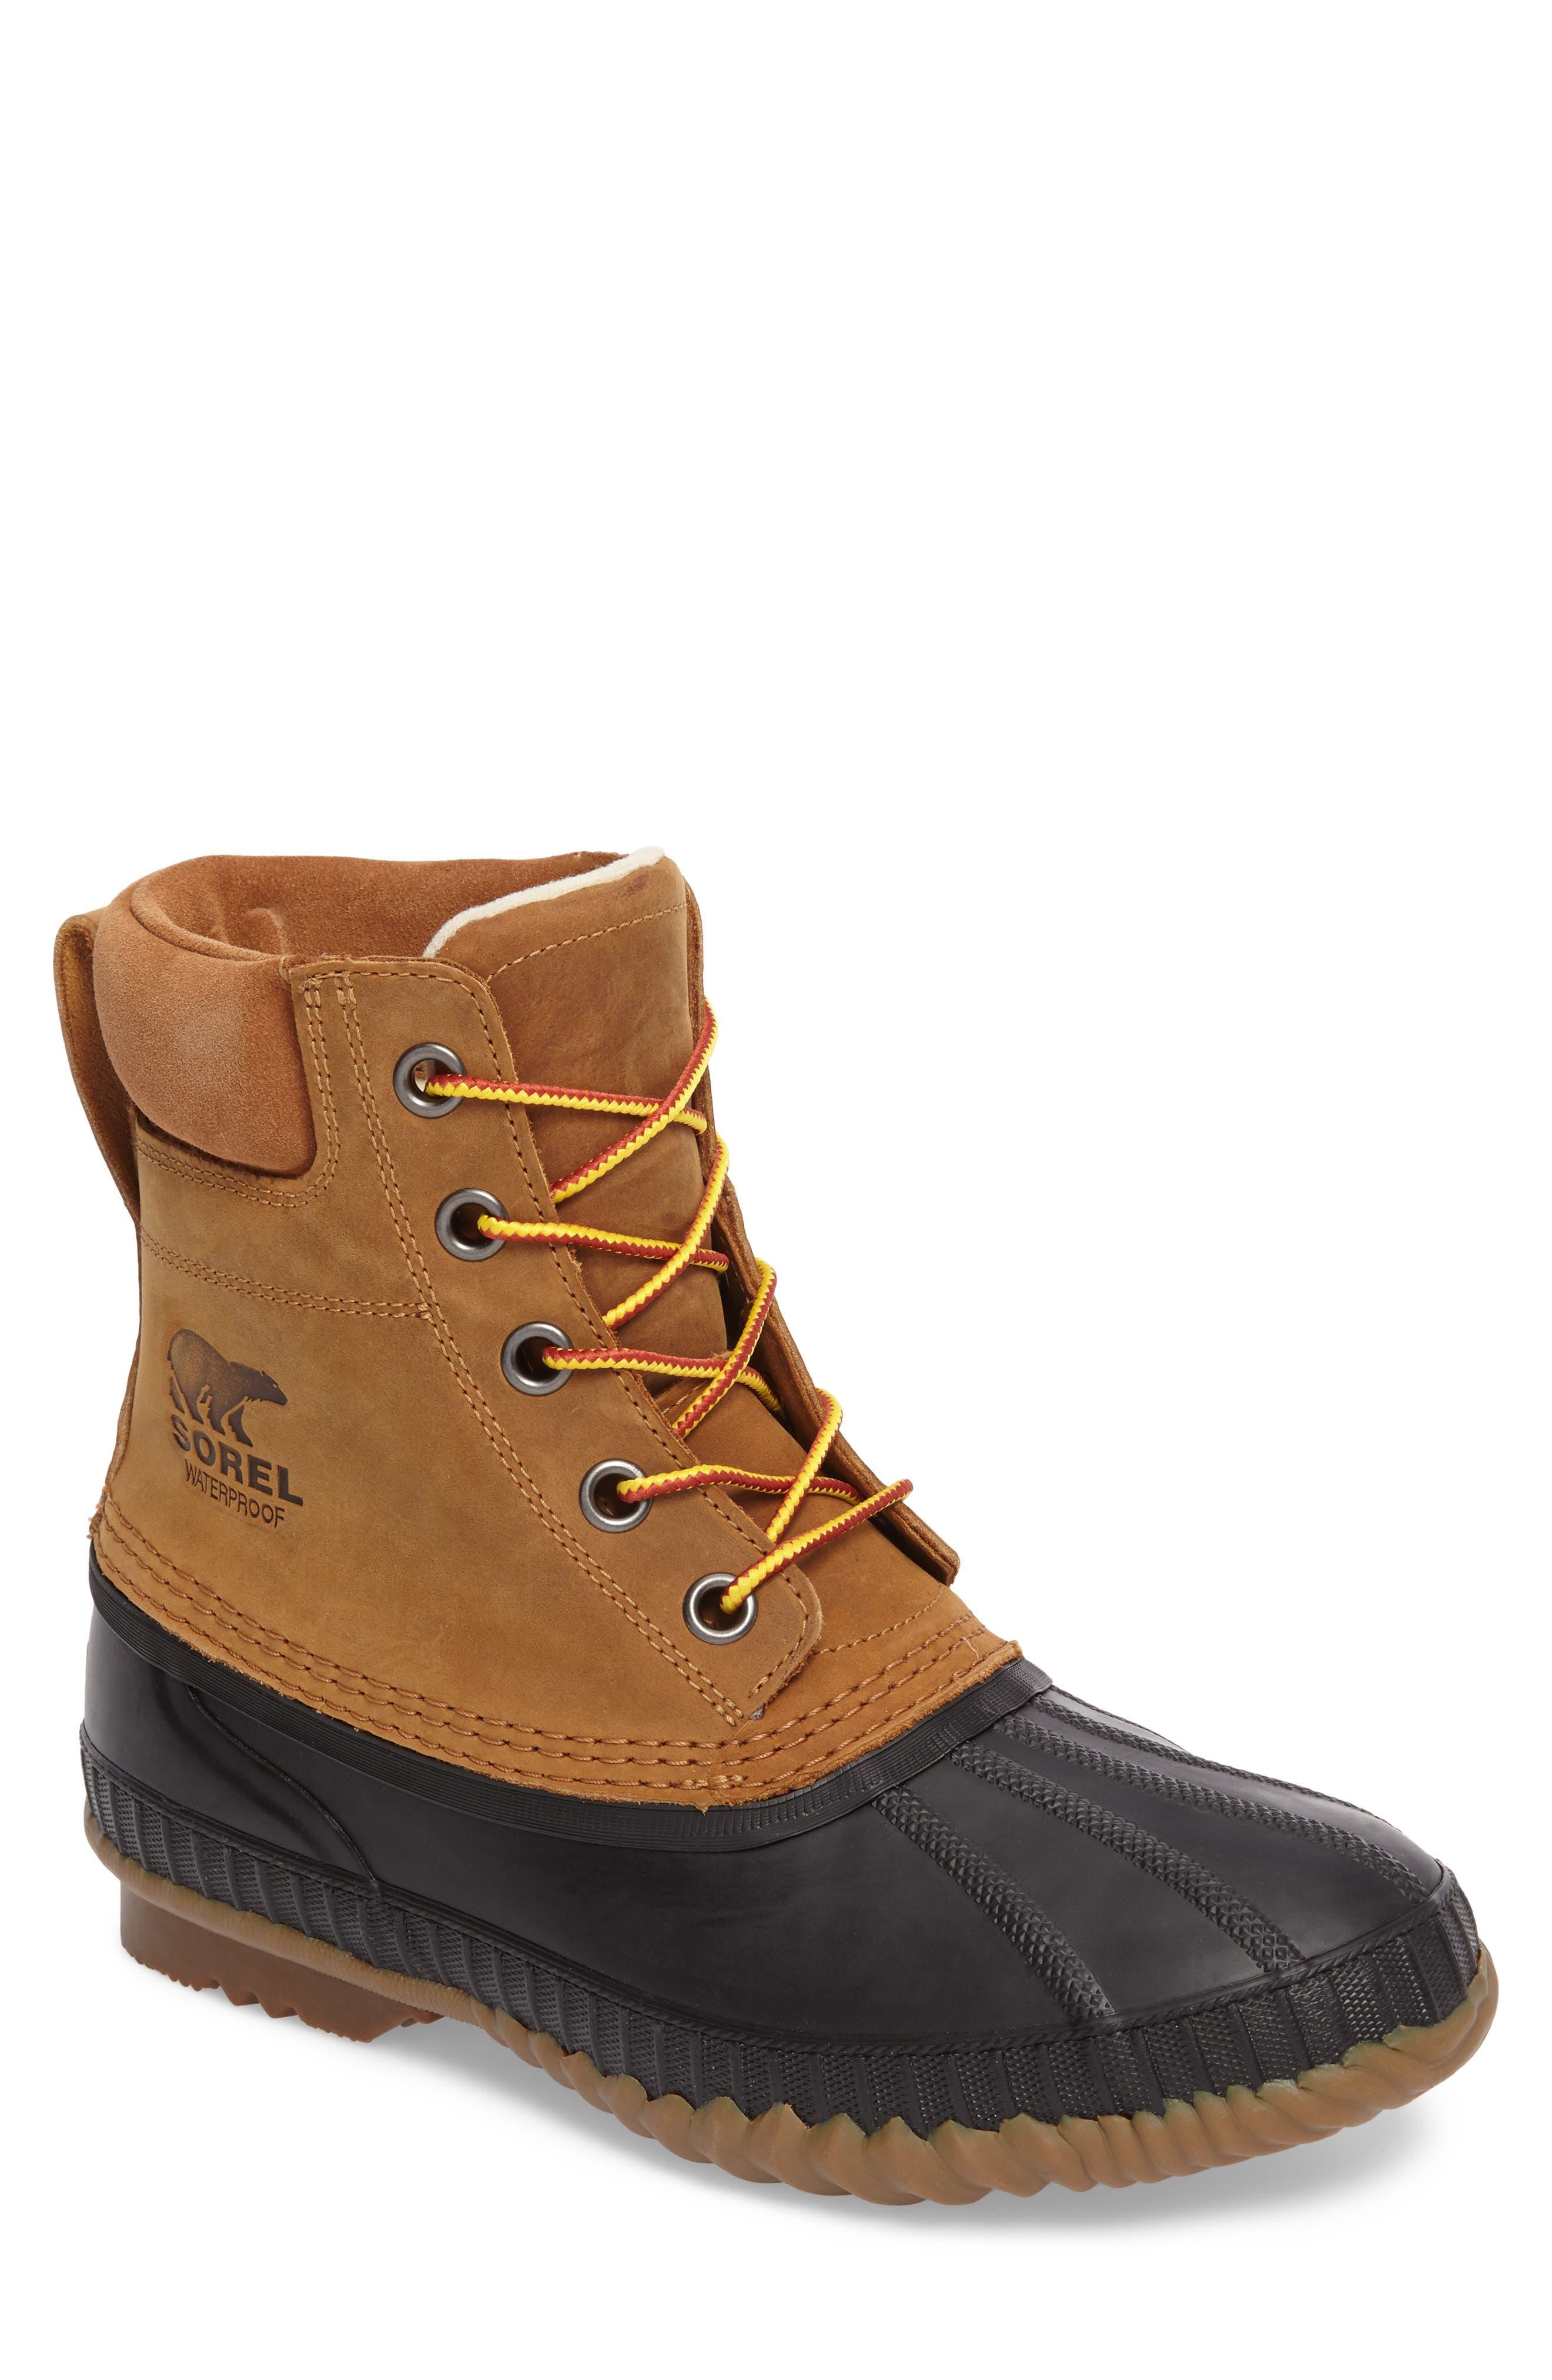 Mens Rain Boots Snow Boots Winter Boots Nordstrom